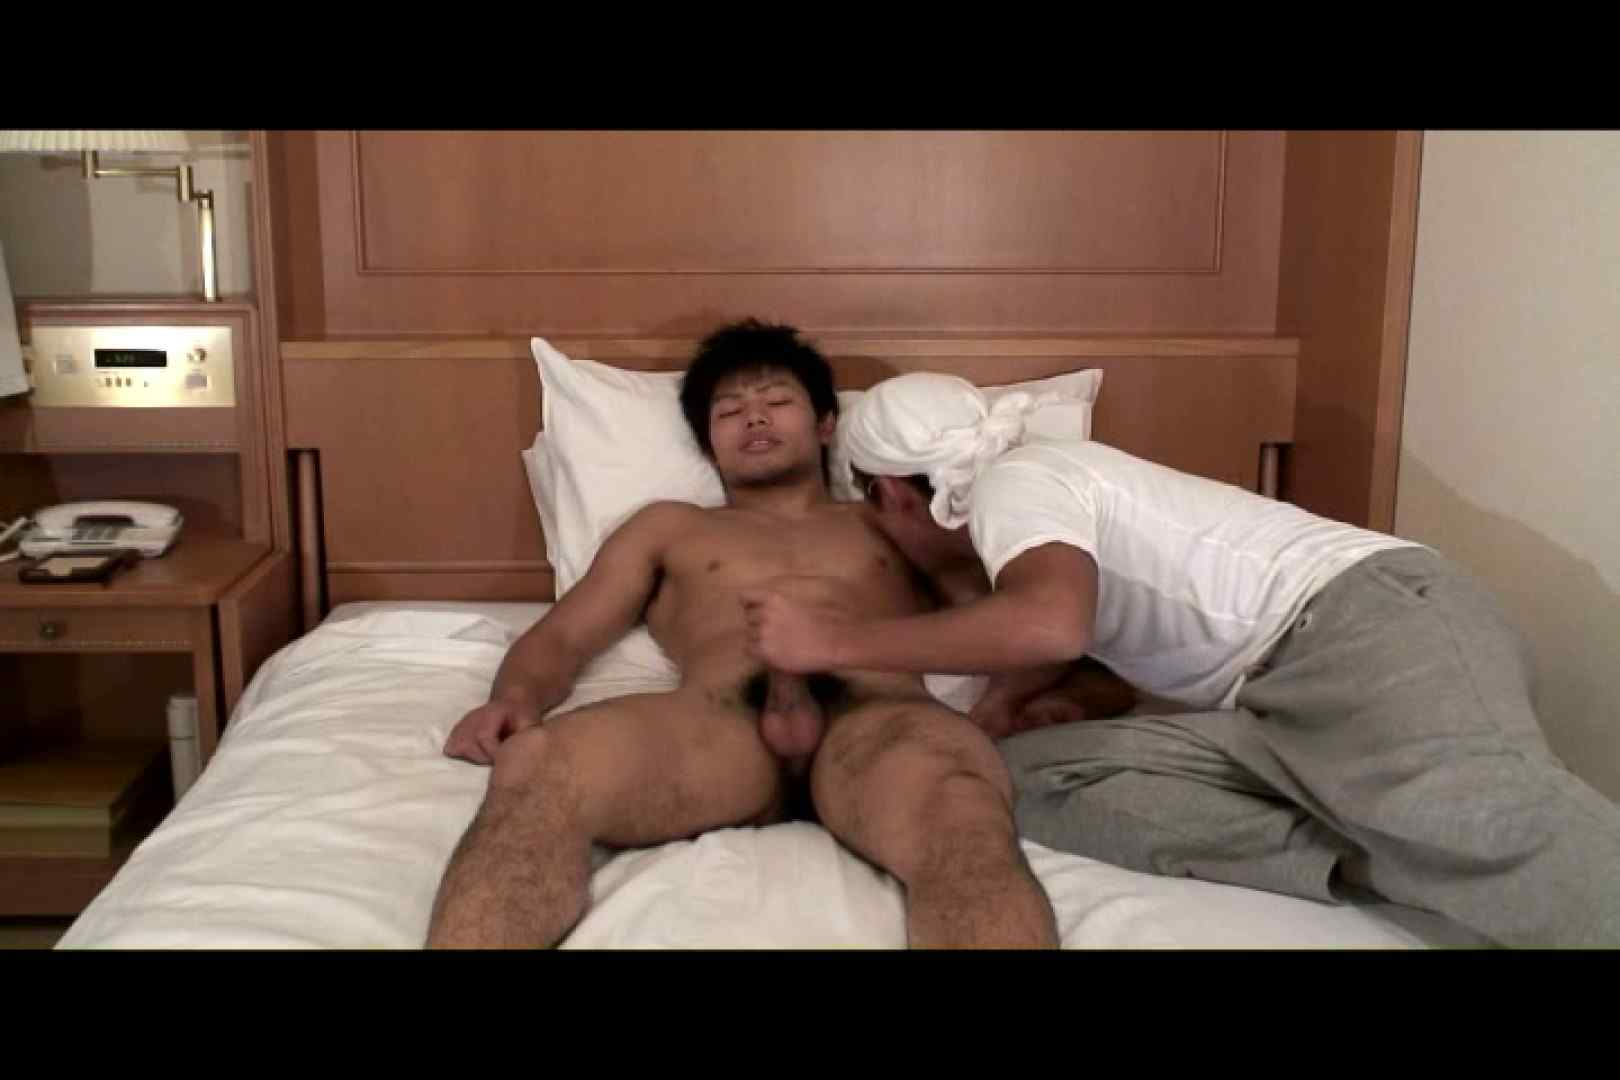 Bistro「イケメン」~Mokkori和風仕立て~vol.02 スポーツマン  57pic 29